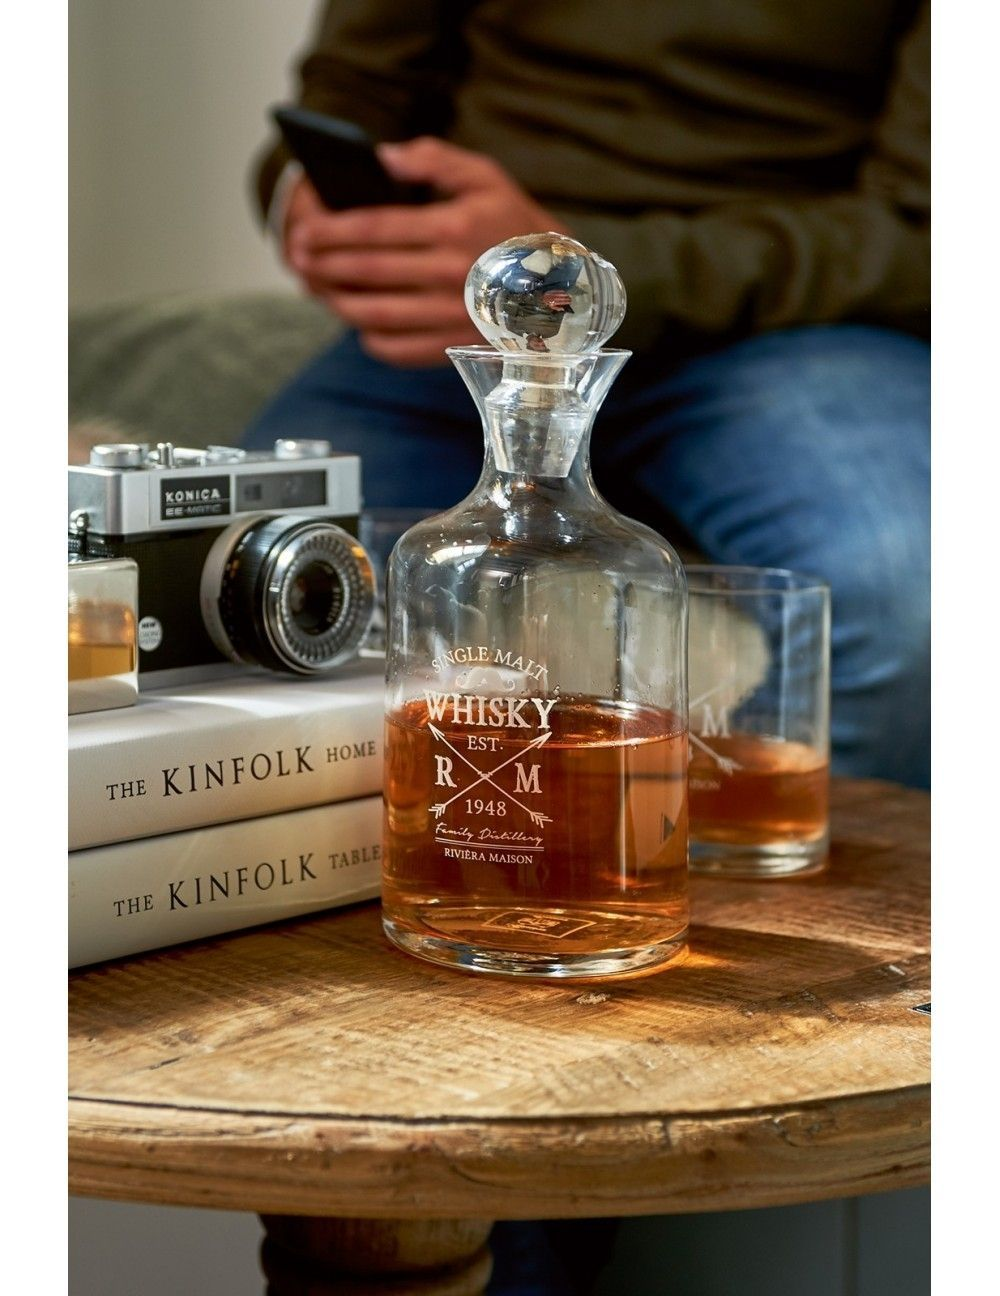 Sada na Whisky RM